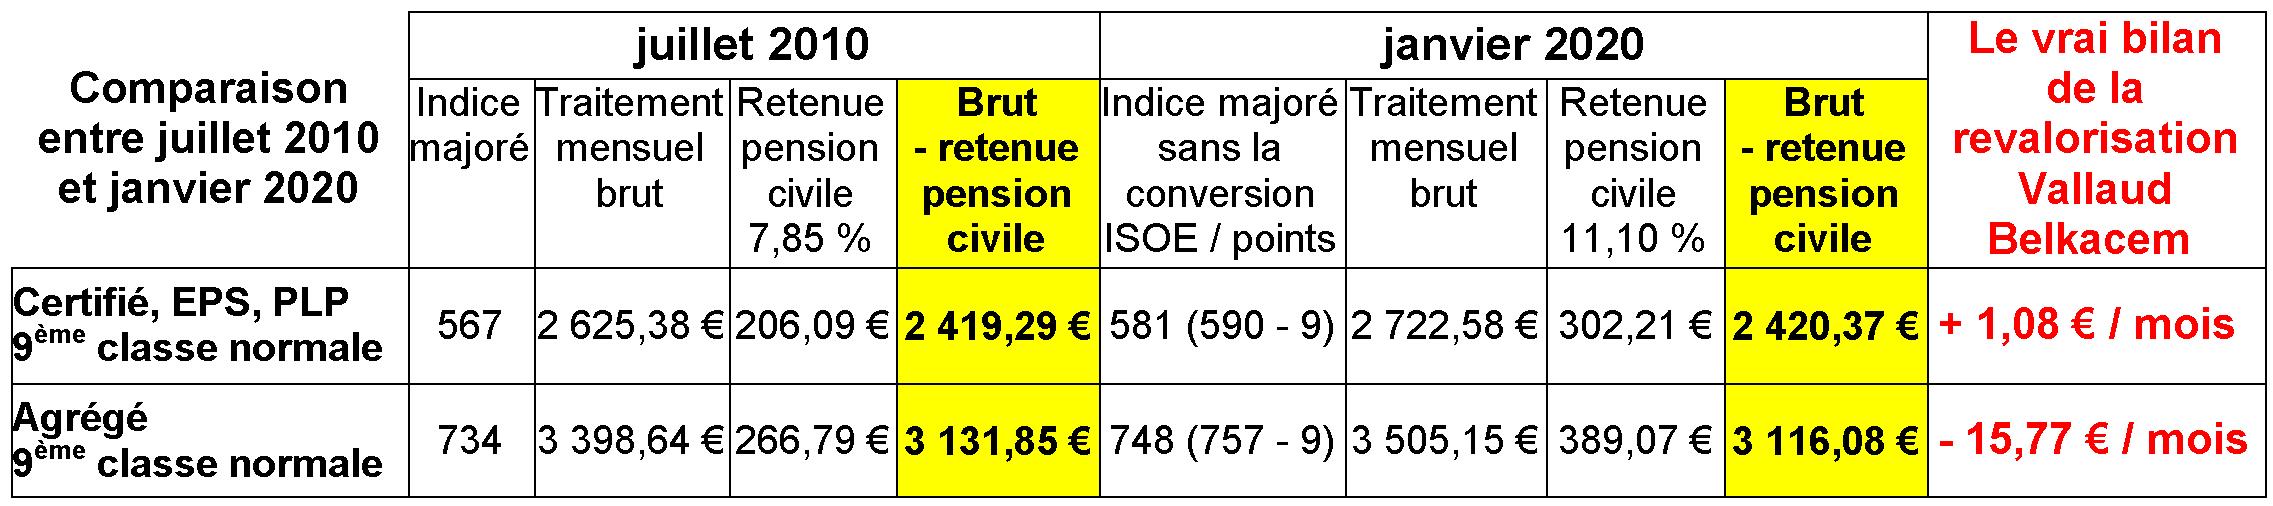 Ppcr arnaque nouvelles carri res revalorisation najat vallaud belkacem sies syndicat ind pendant - Grille salaire professeur certifie ...